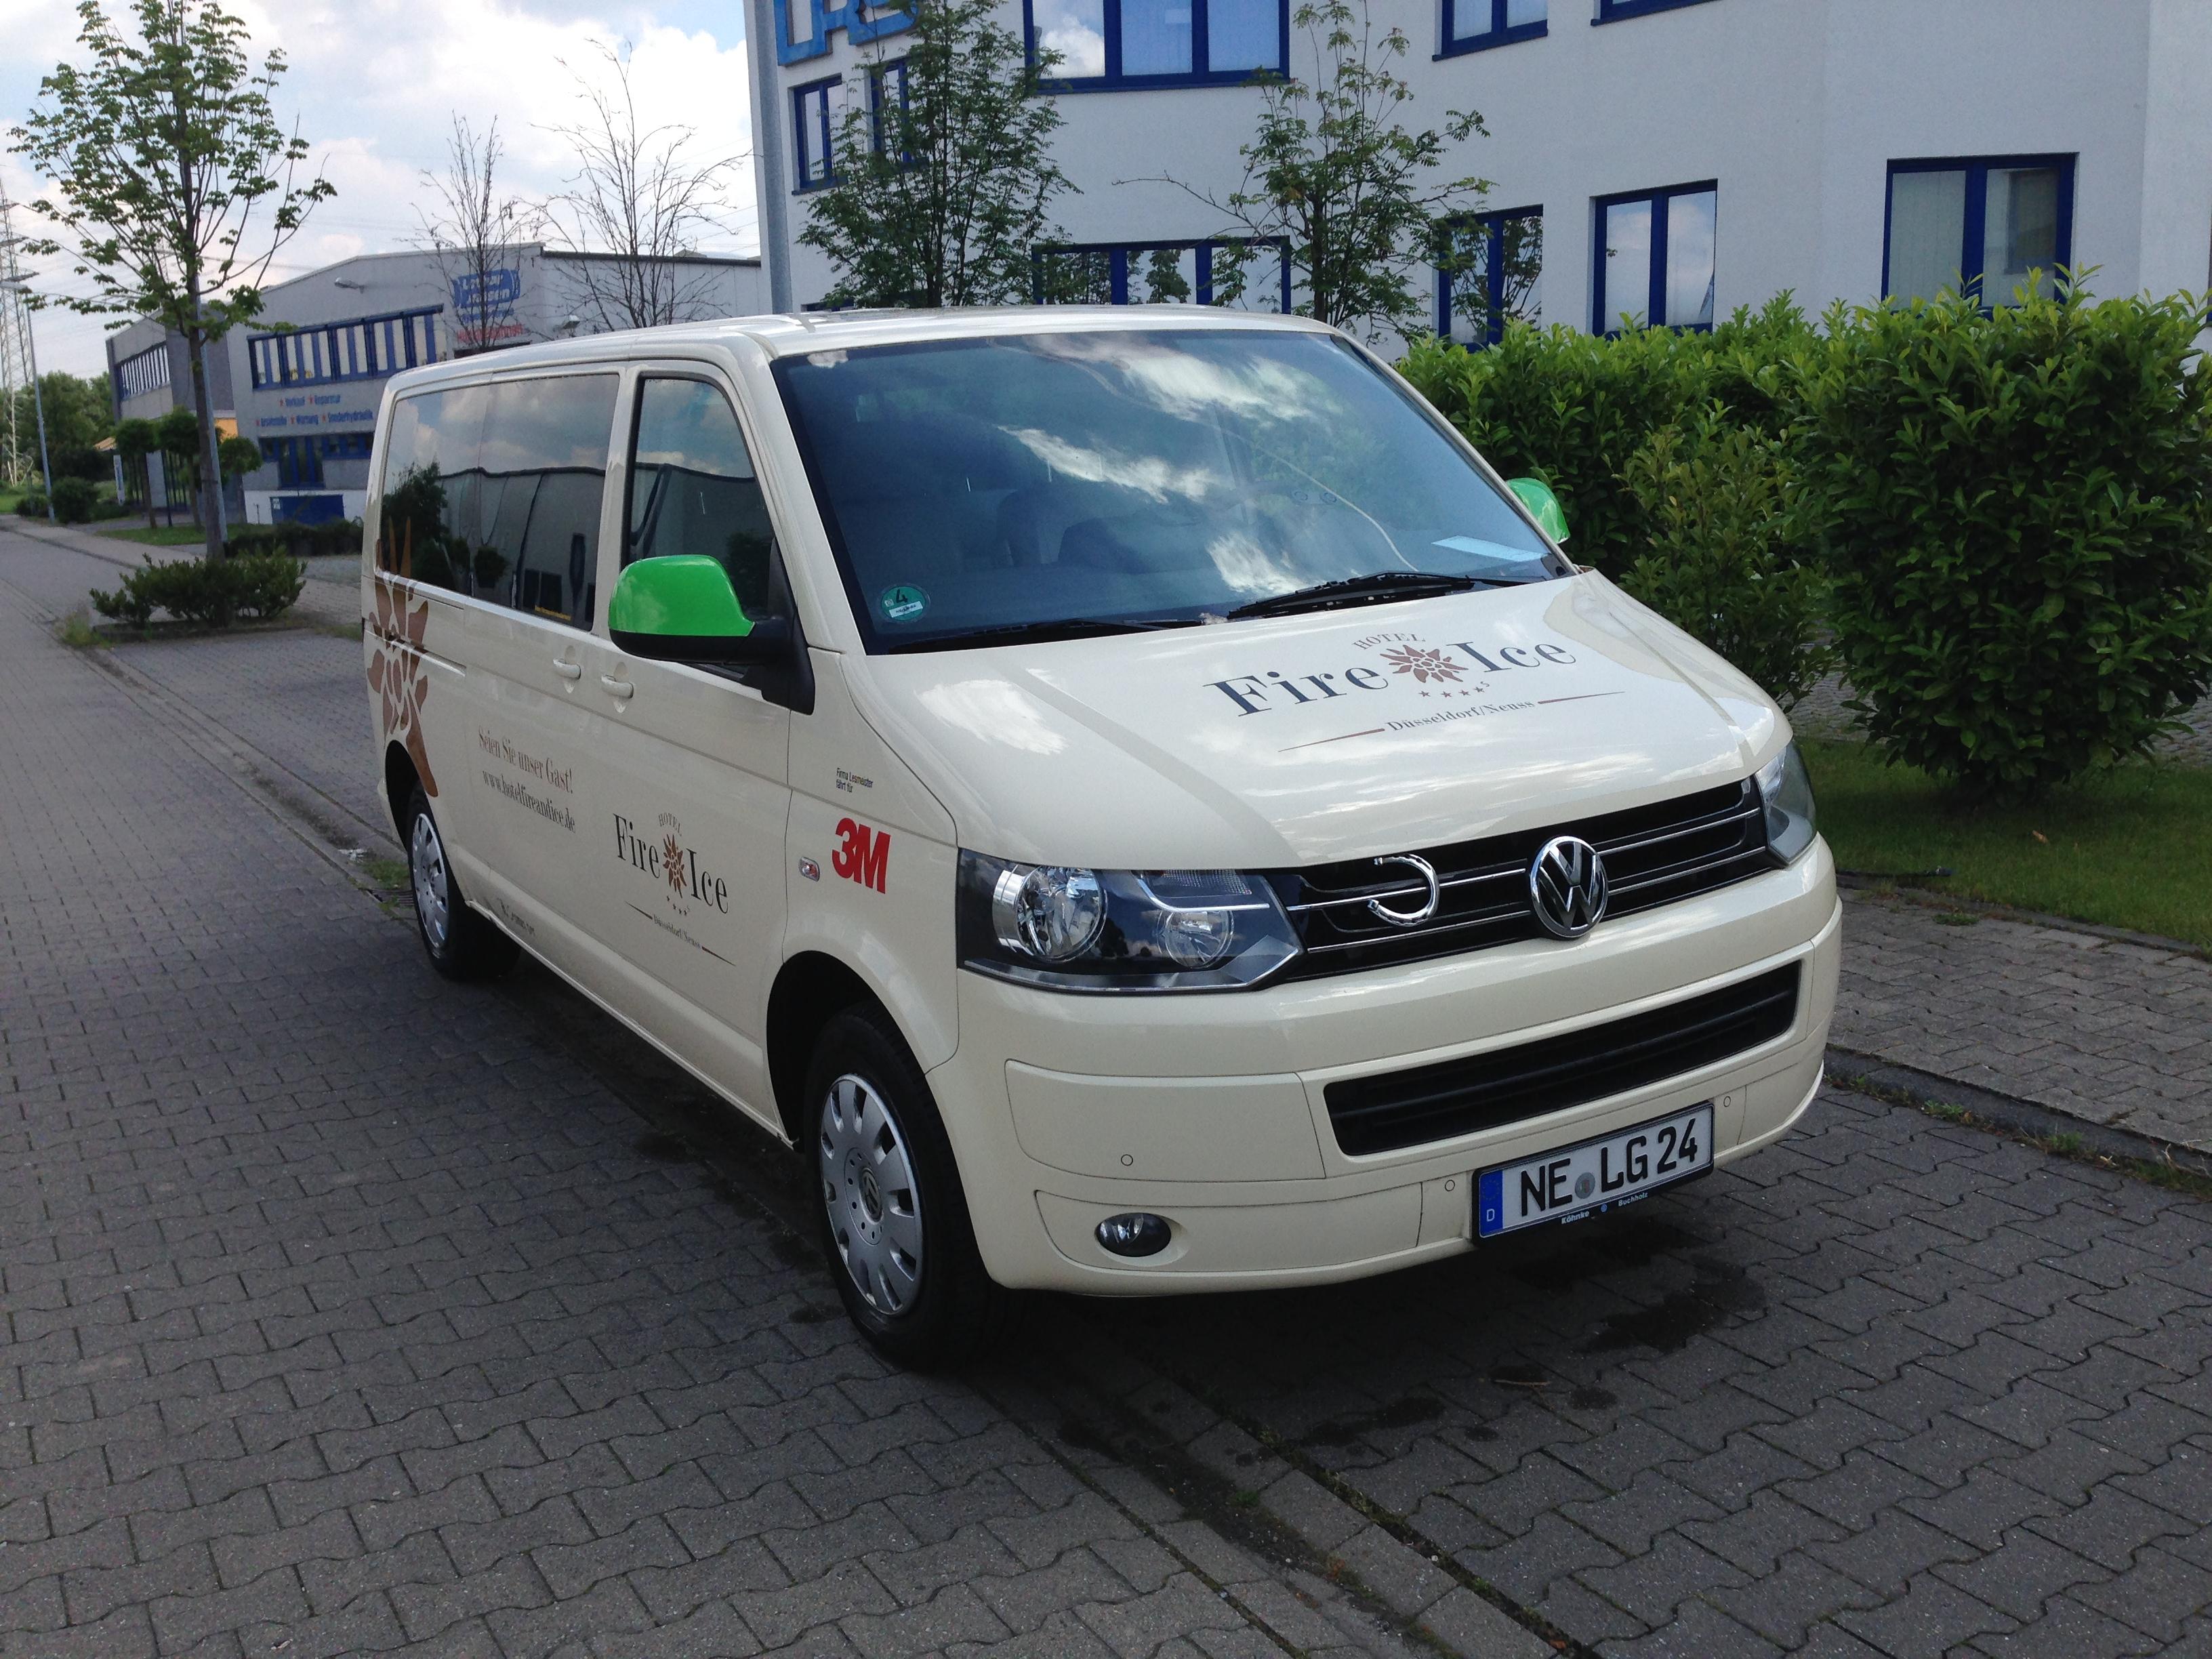 Foto de Taxi Holzbüttgen Kaarst